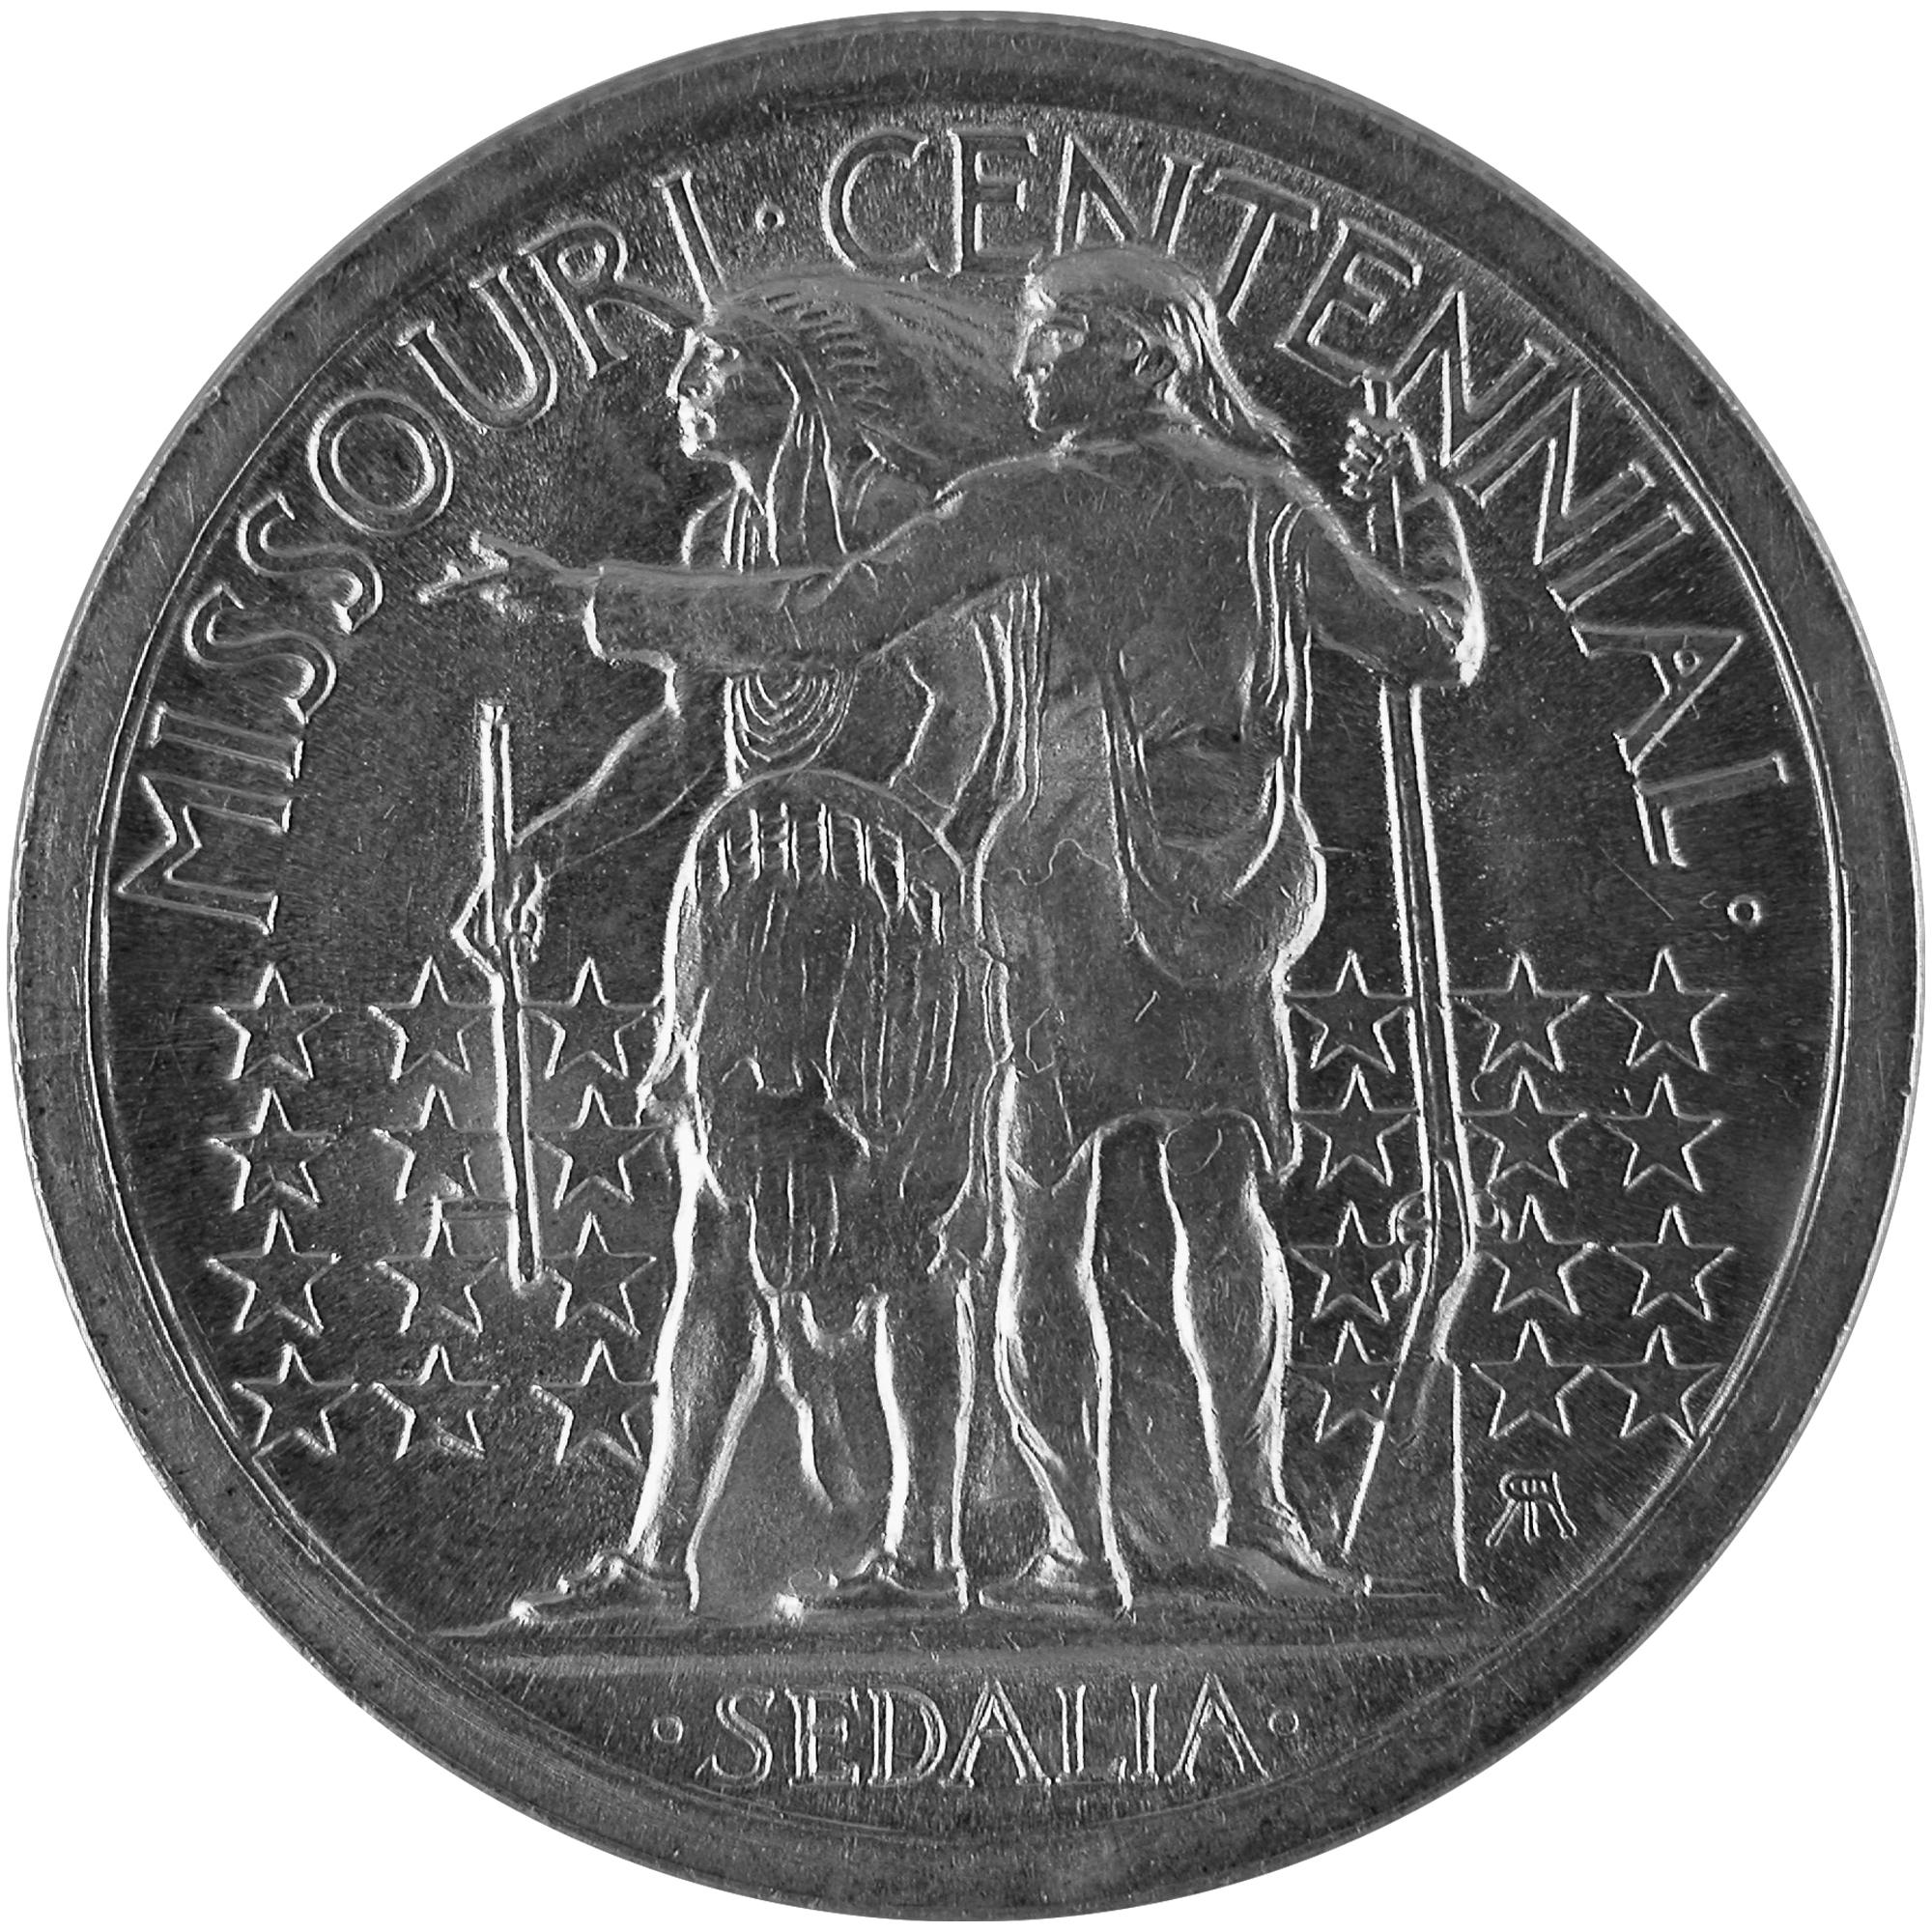 1921 Missouri Centennial Commemorative Silver Half Dollar Coin Reverse